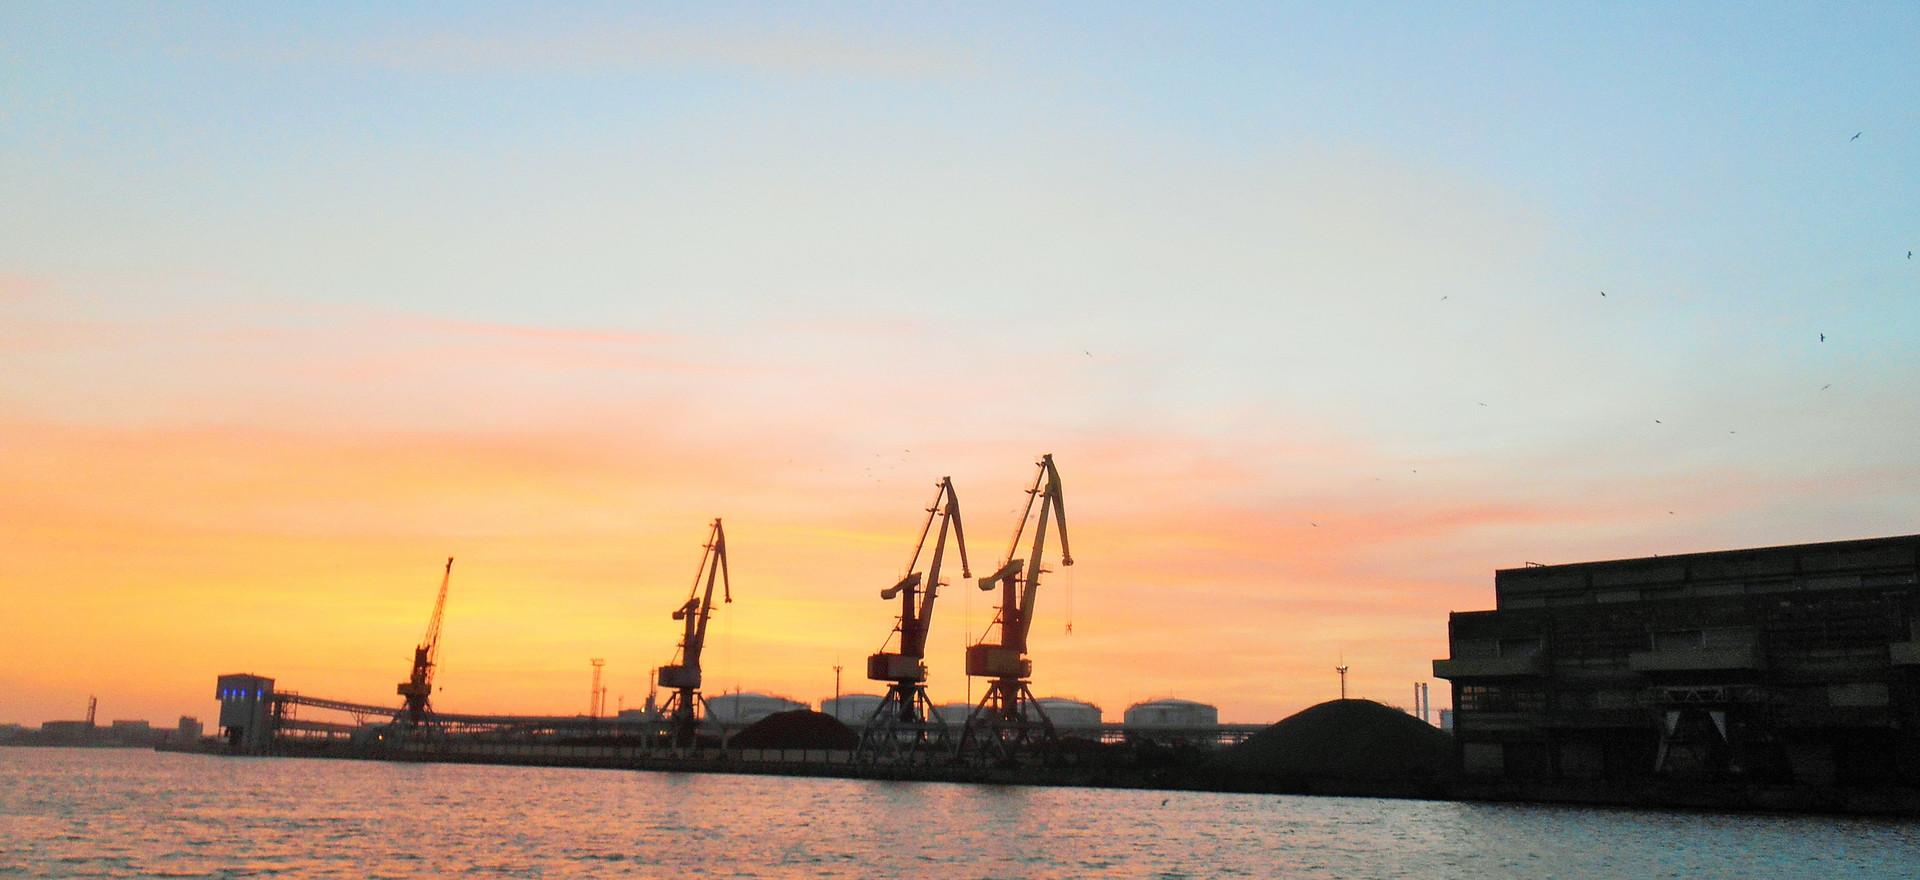 Giraffes dialog at sunset, Ventspils, April 2017